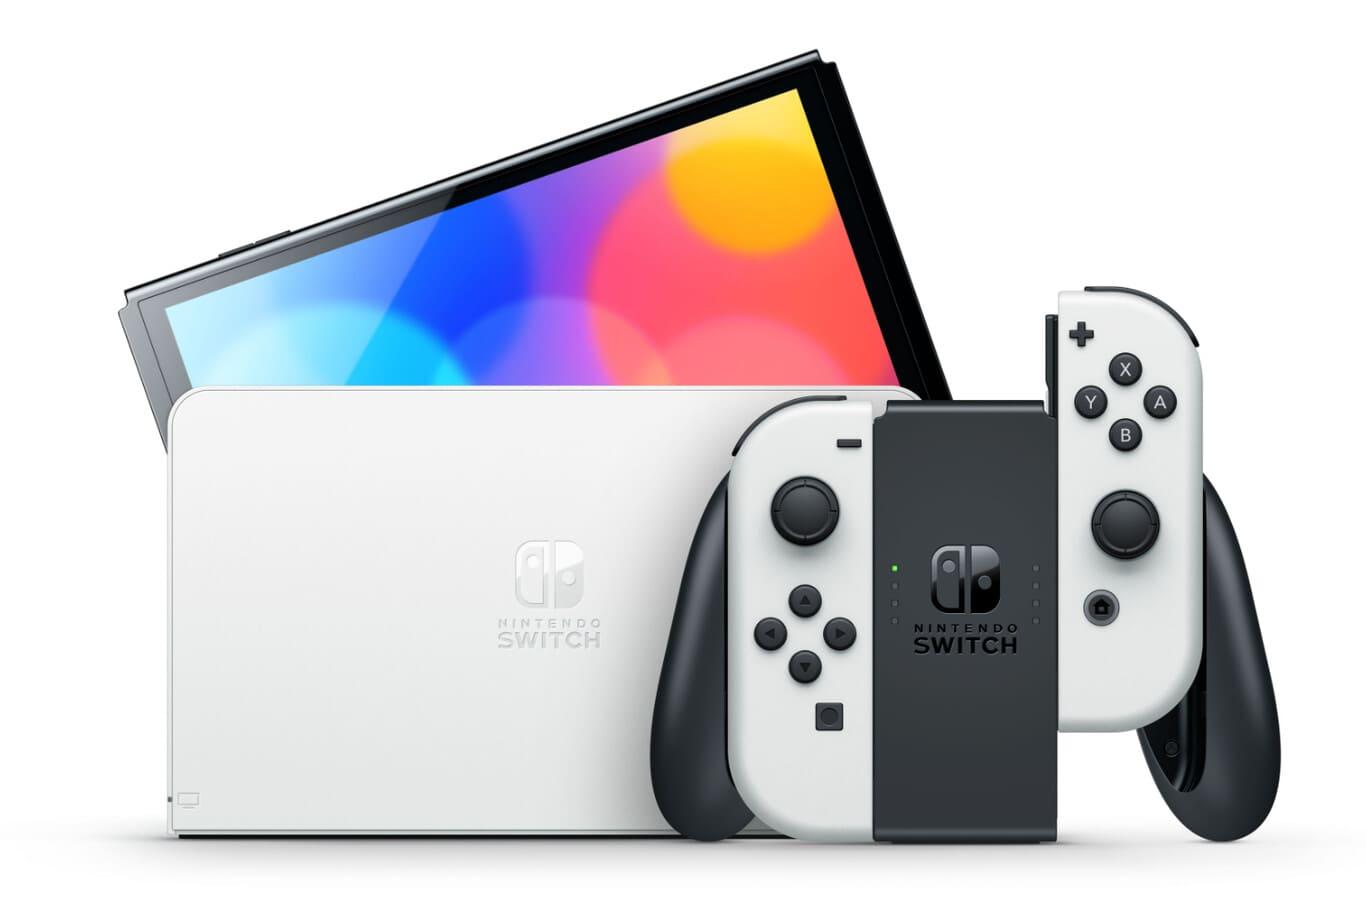 Nintendo-Switch-pantalla-OLED-con-dock-tele